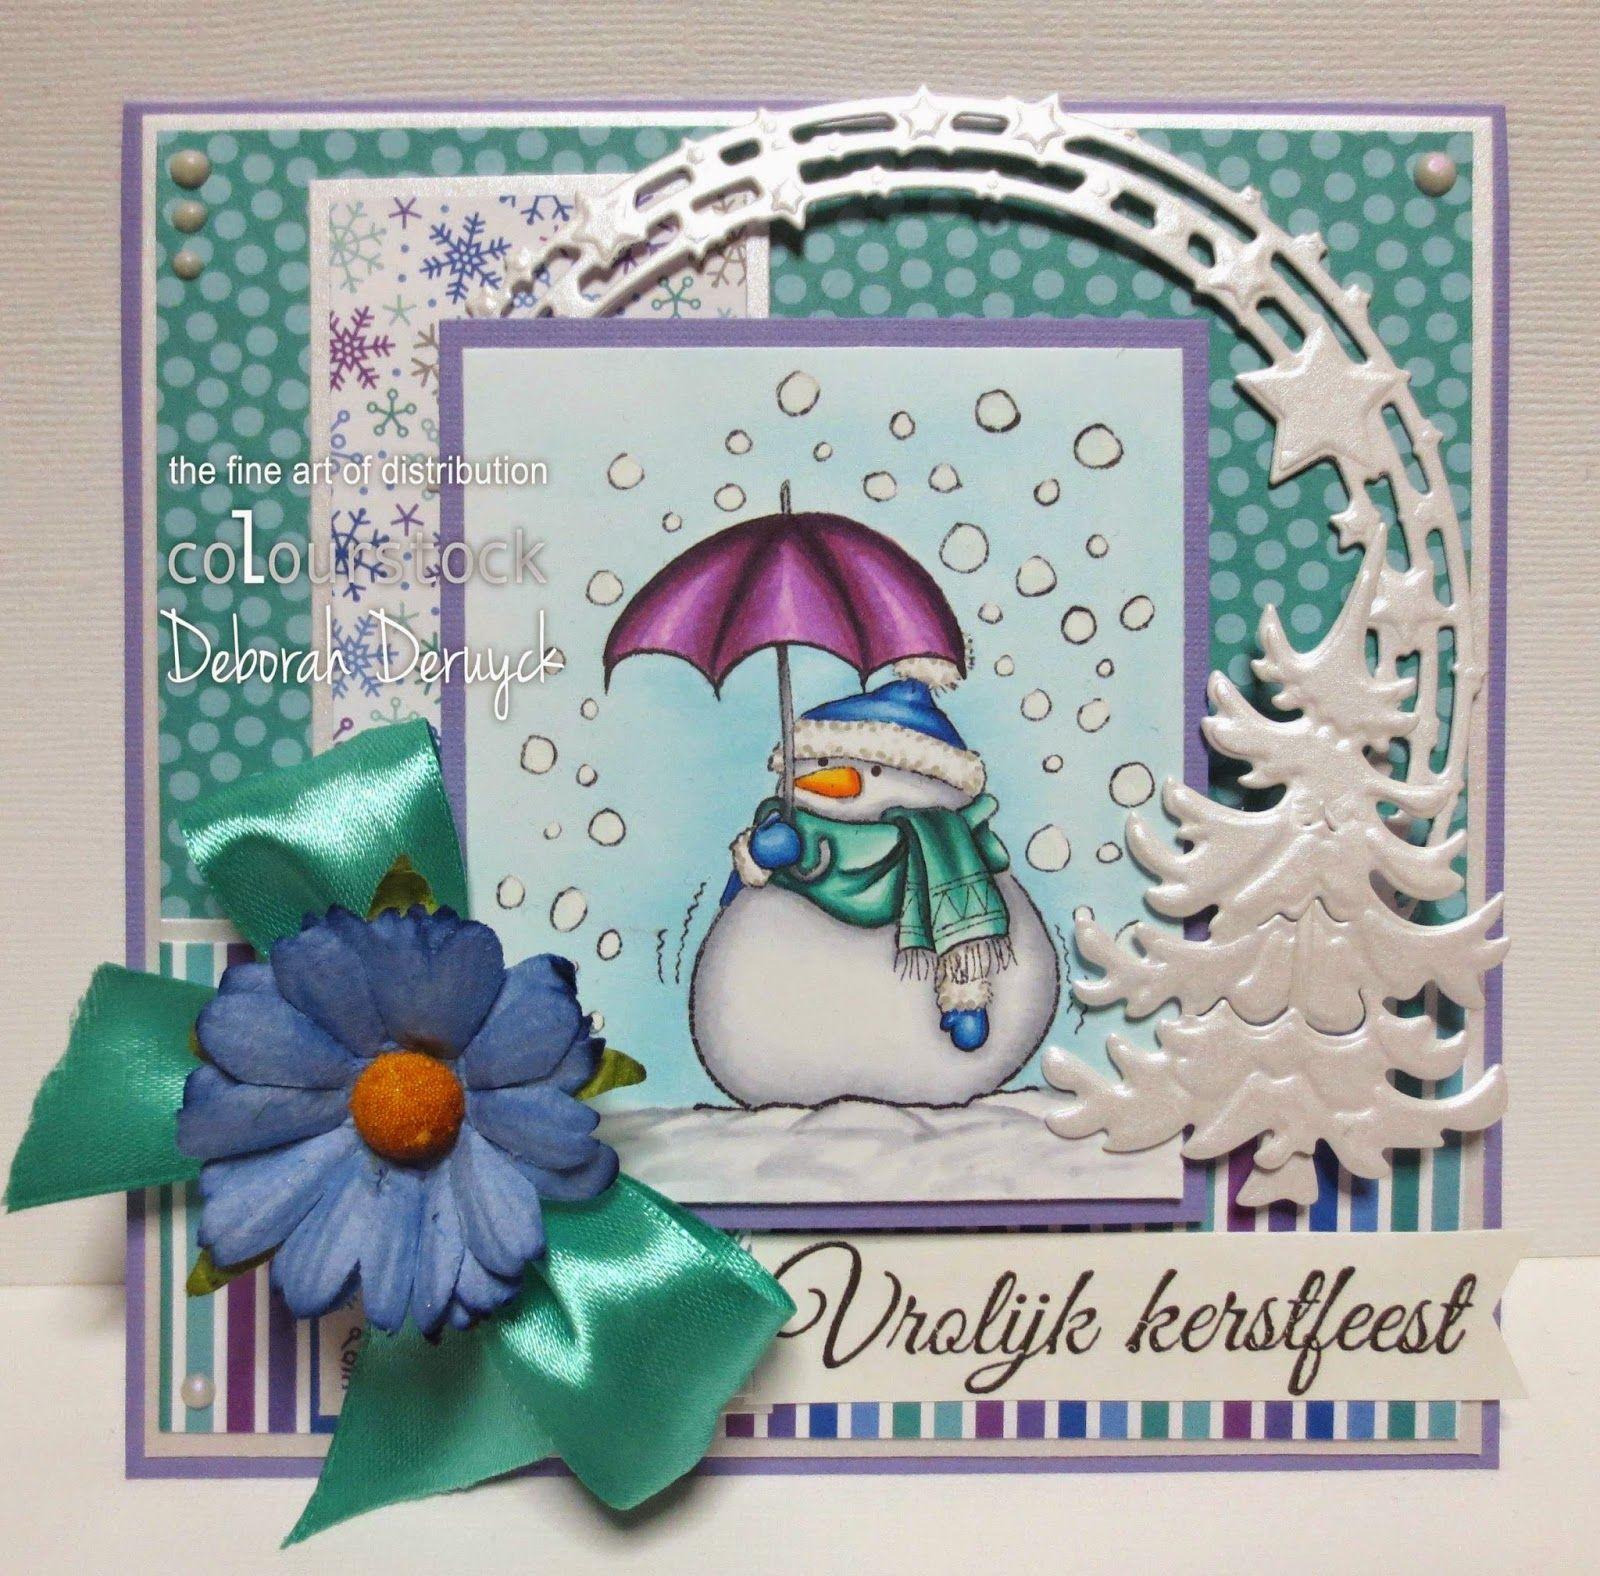 Copic card made by DT member Deborah